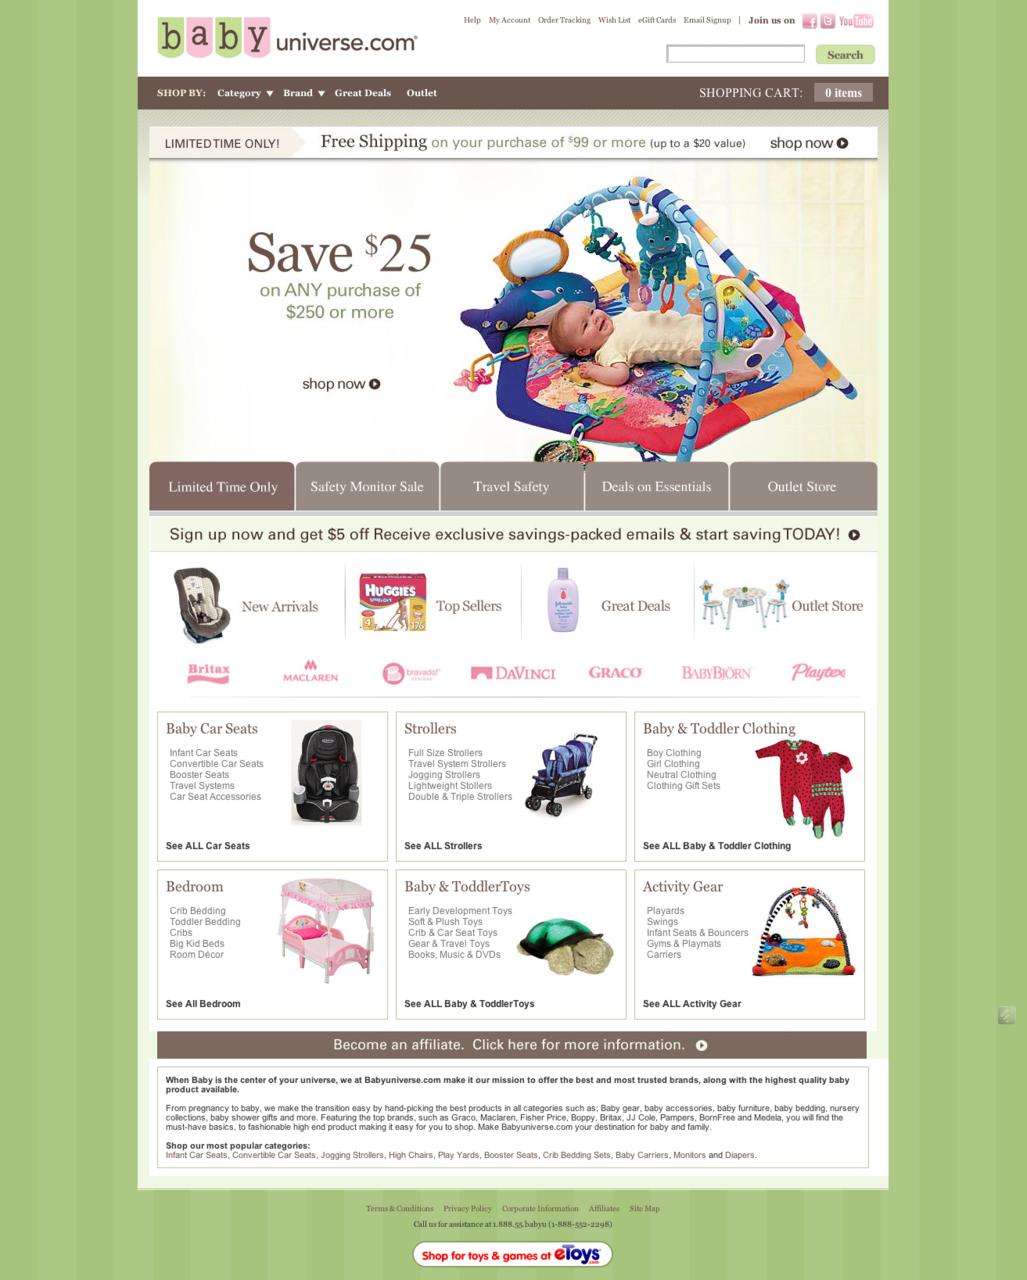 www.babyuniverse.com